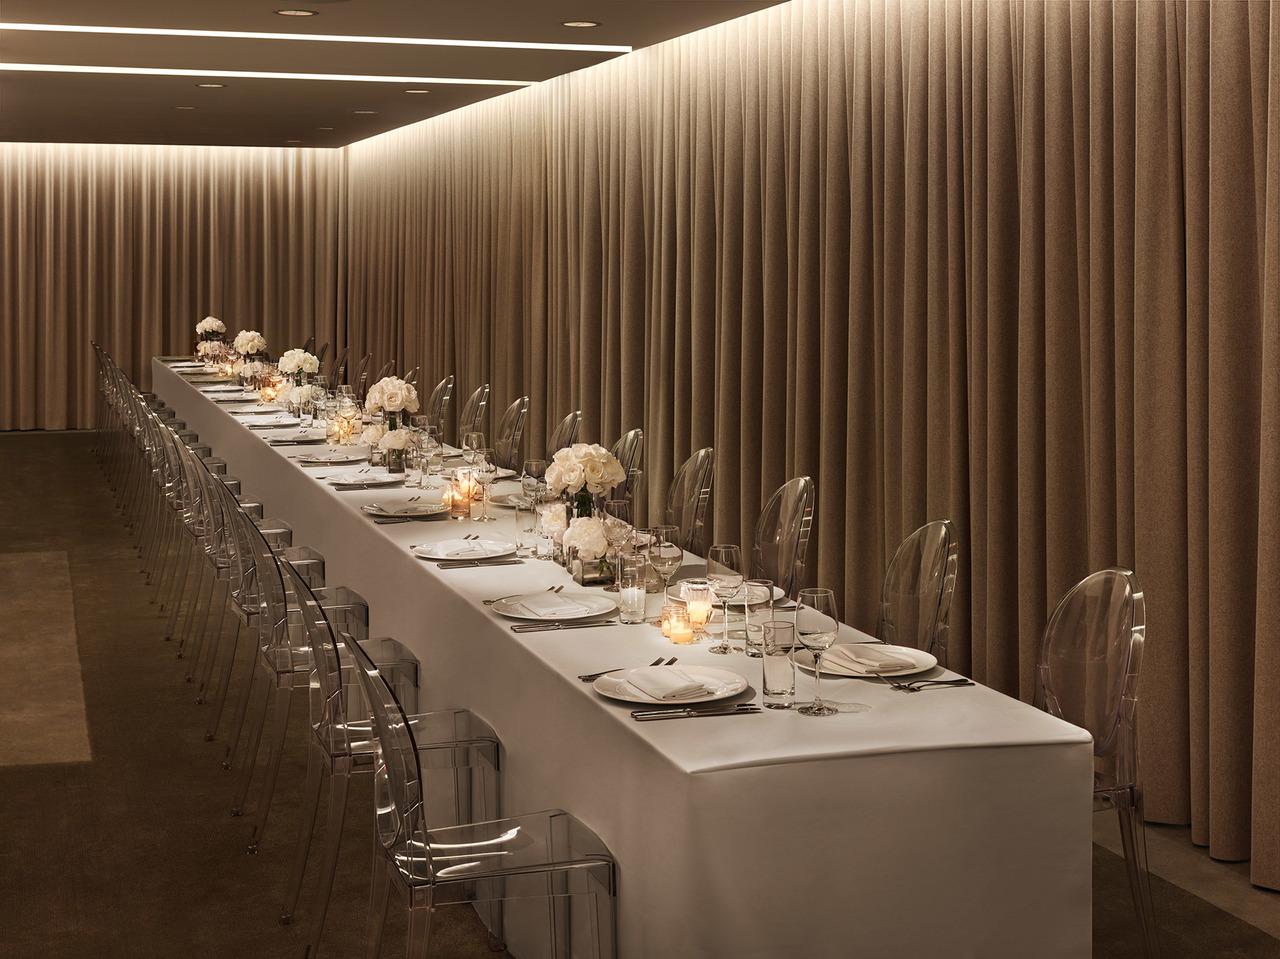 NYC-EDITION-Banquet-1870x1400.jpg